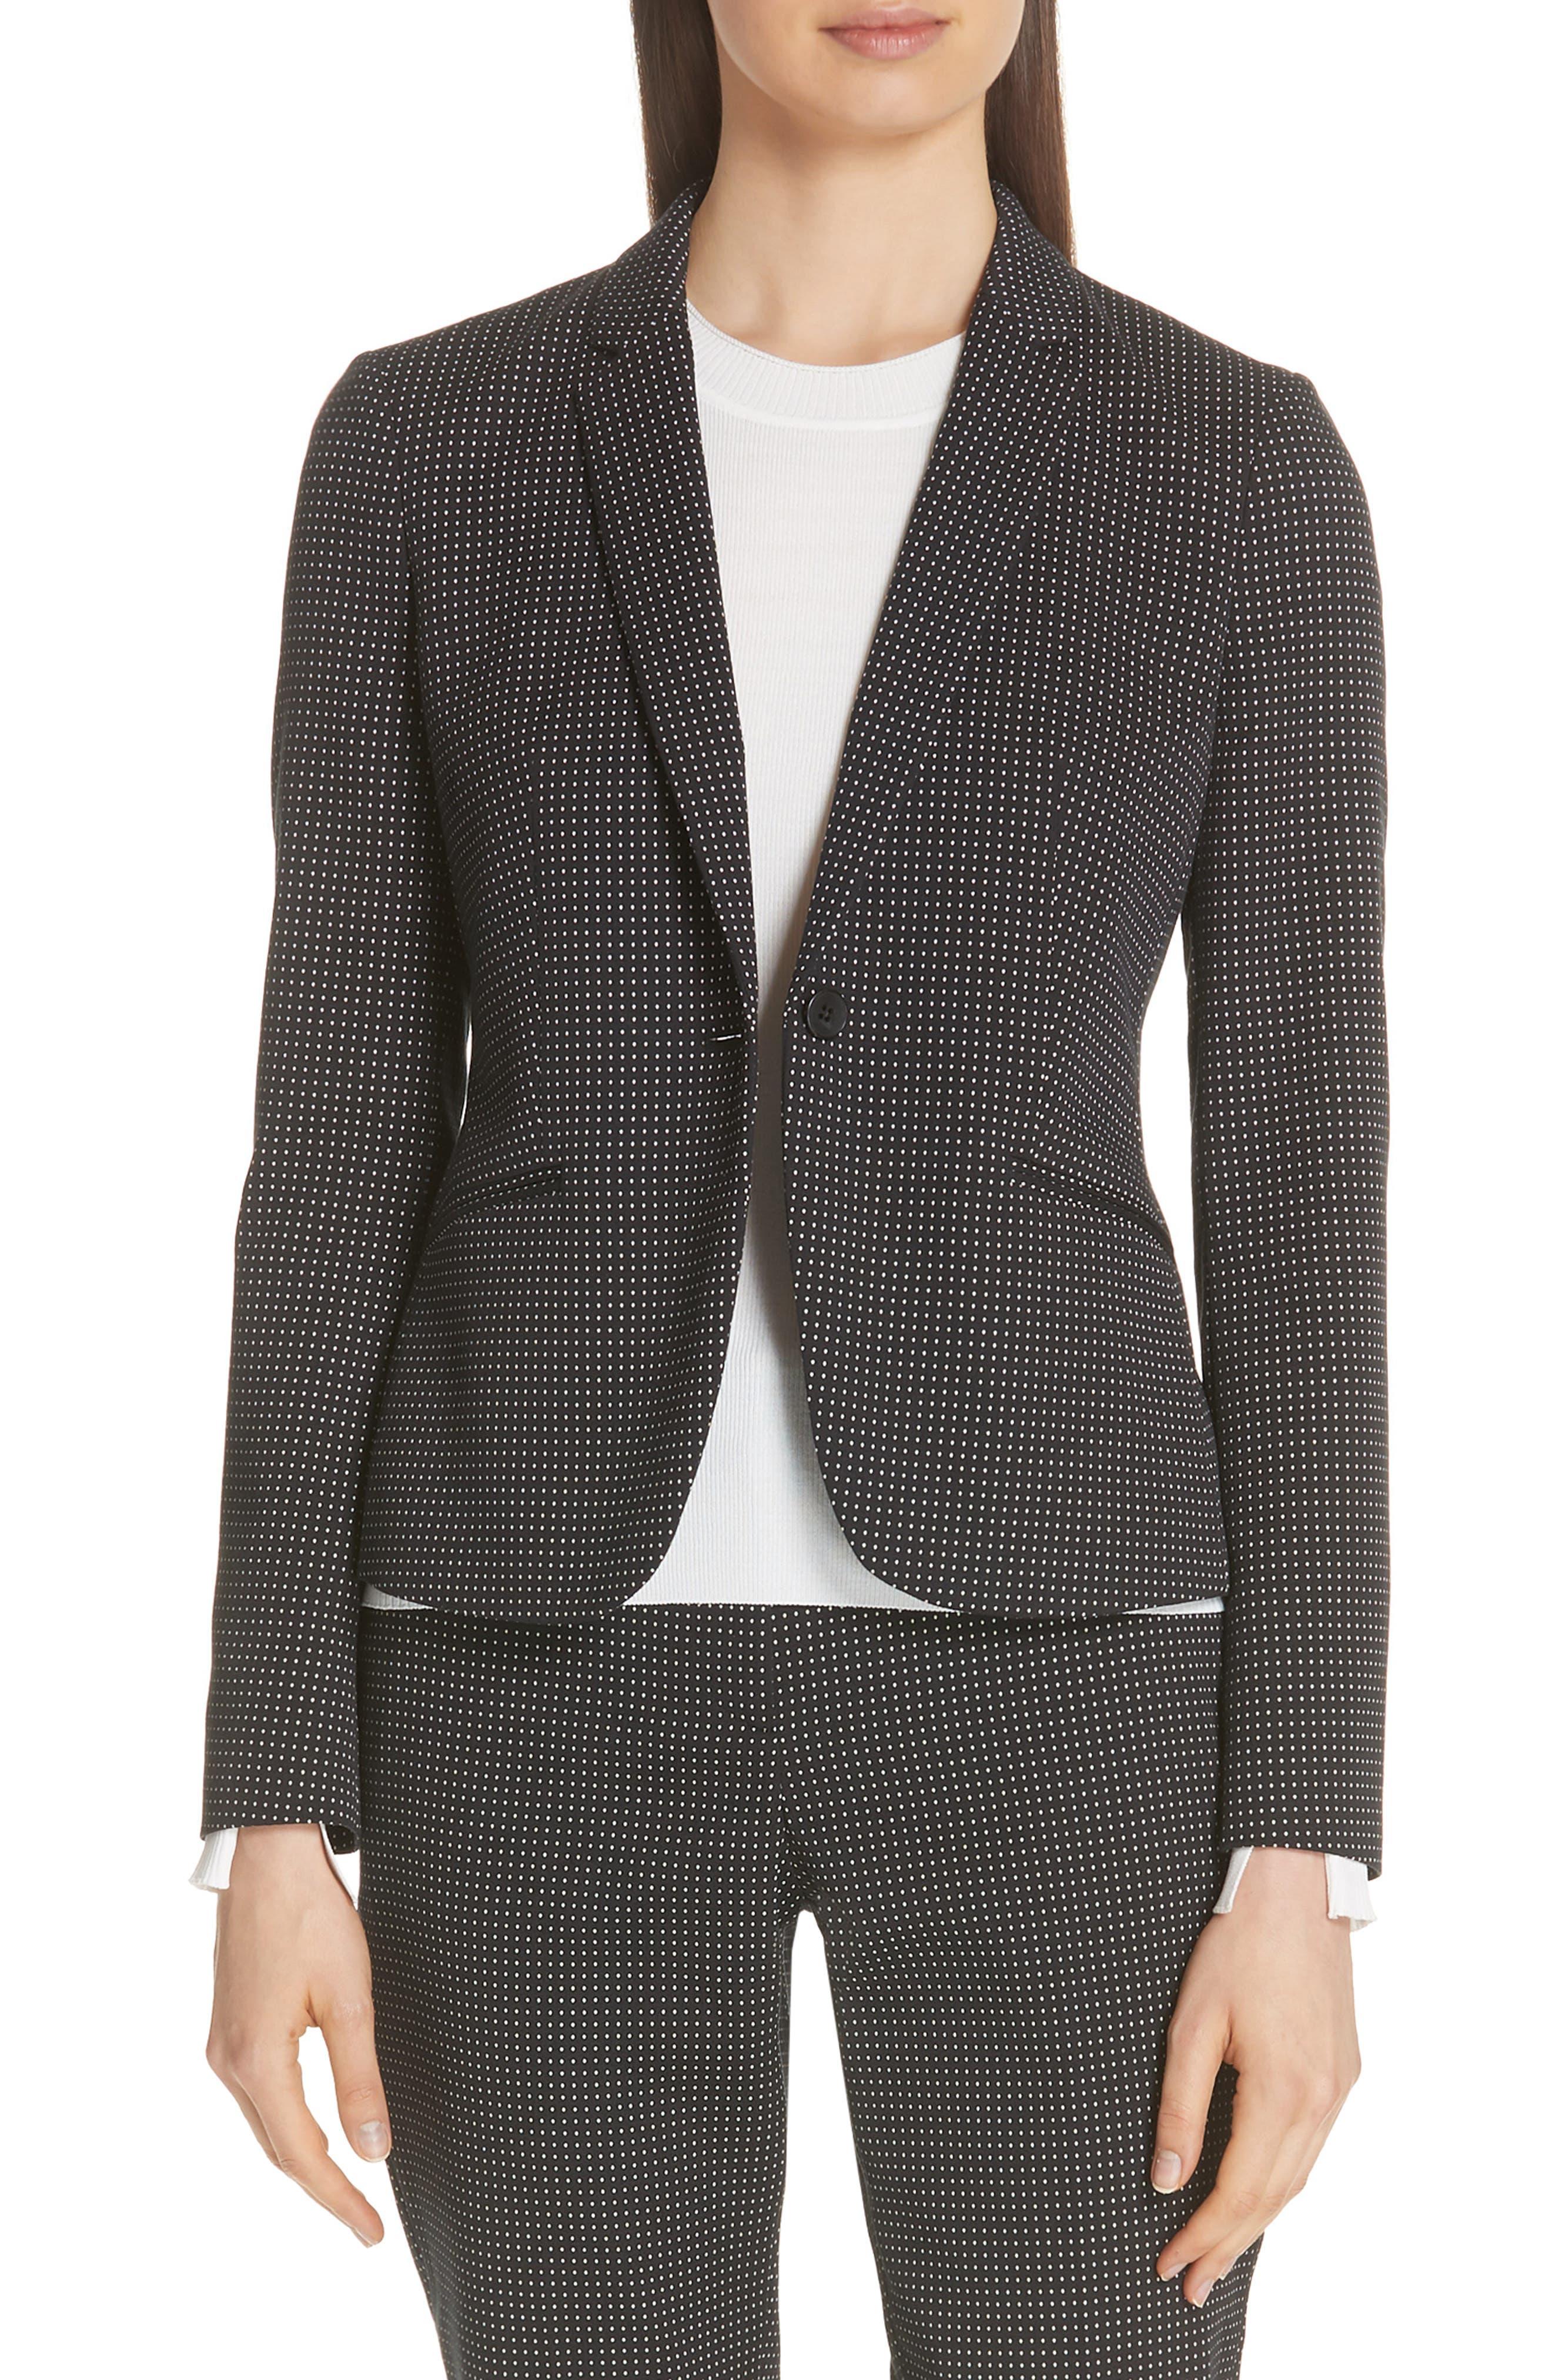 Jumano Dot Stretch Jacket,                         Main,                         color, BLACK FANTASY